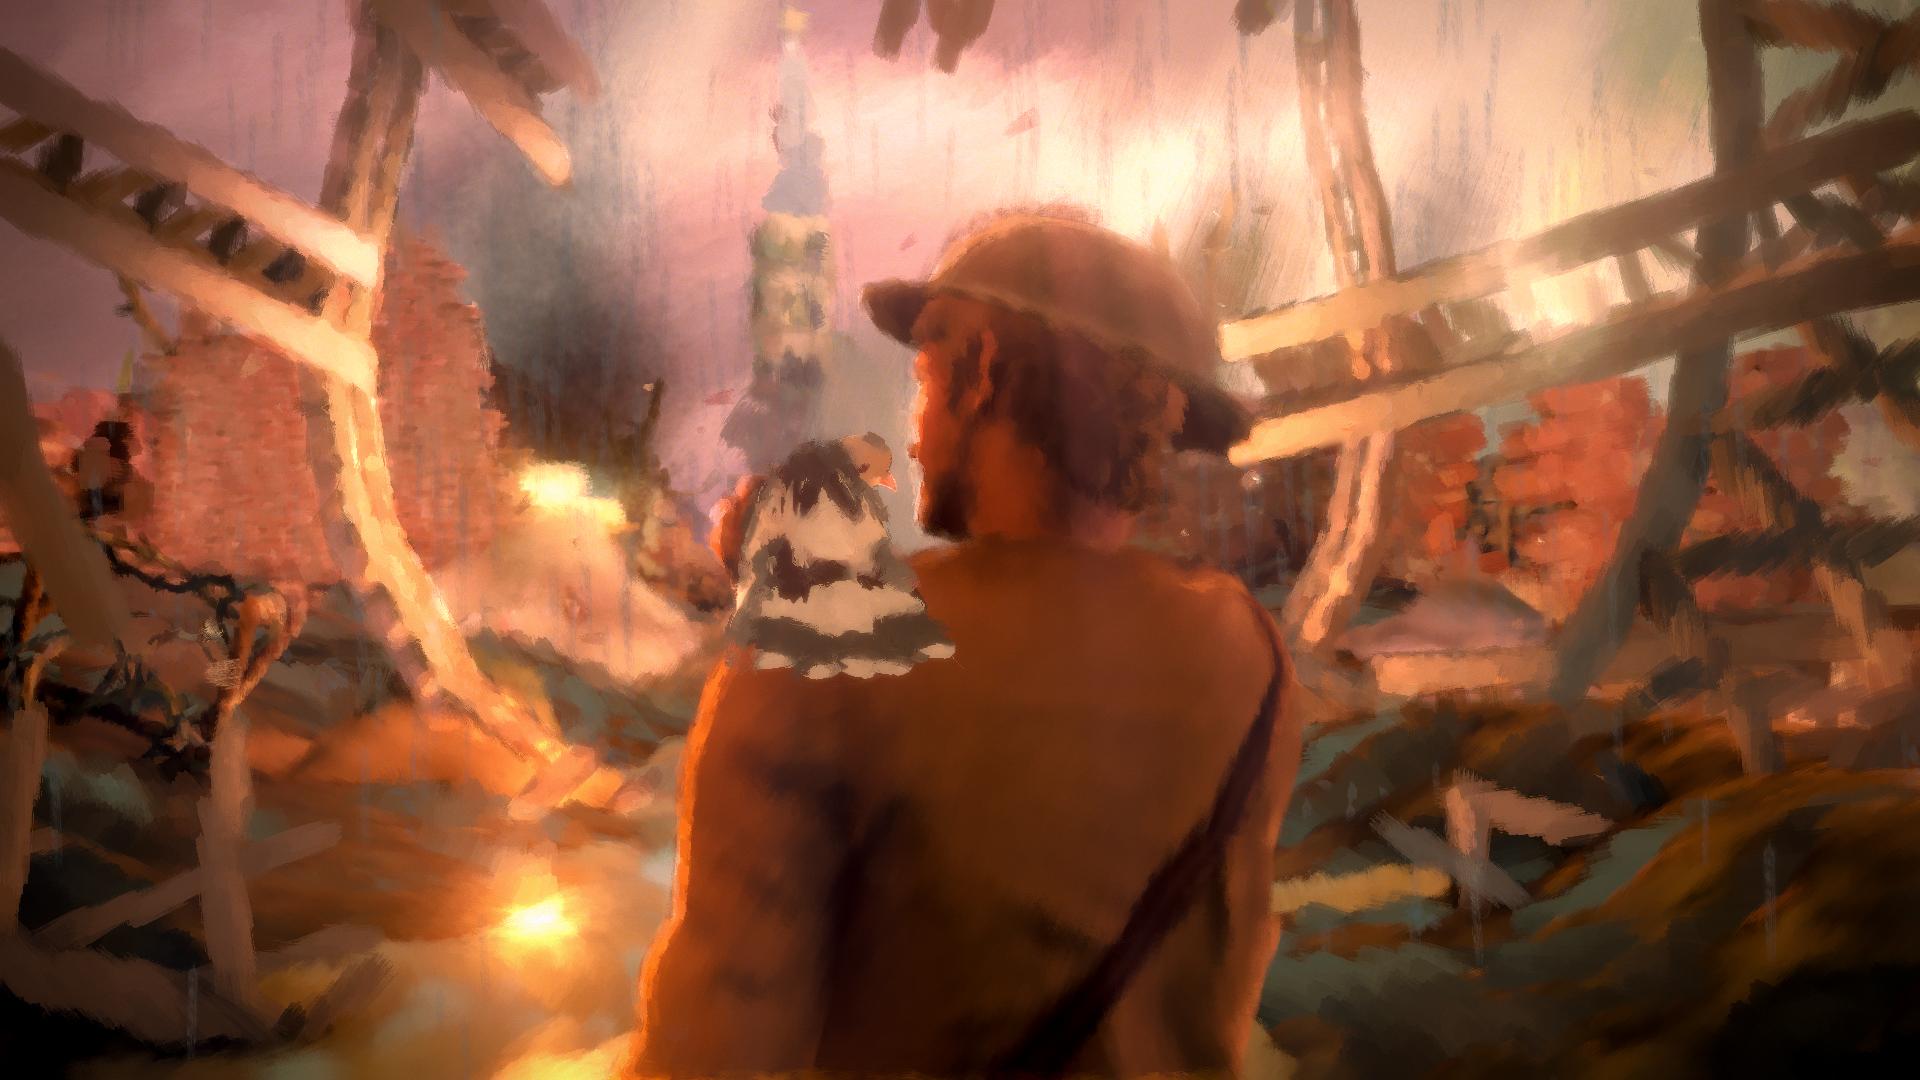 11-11 Memories Retold PS4 Pro Xbox One X Review Kritik Test Bandai Namco Entertainment Anti Kriegsspiel Worldwar I Erster Weltkrieg 1918 11 11 1918 Harry Zeppelin